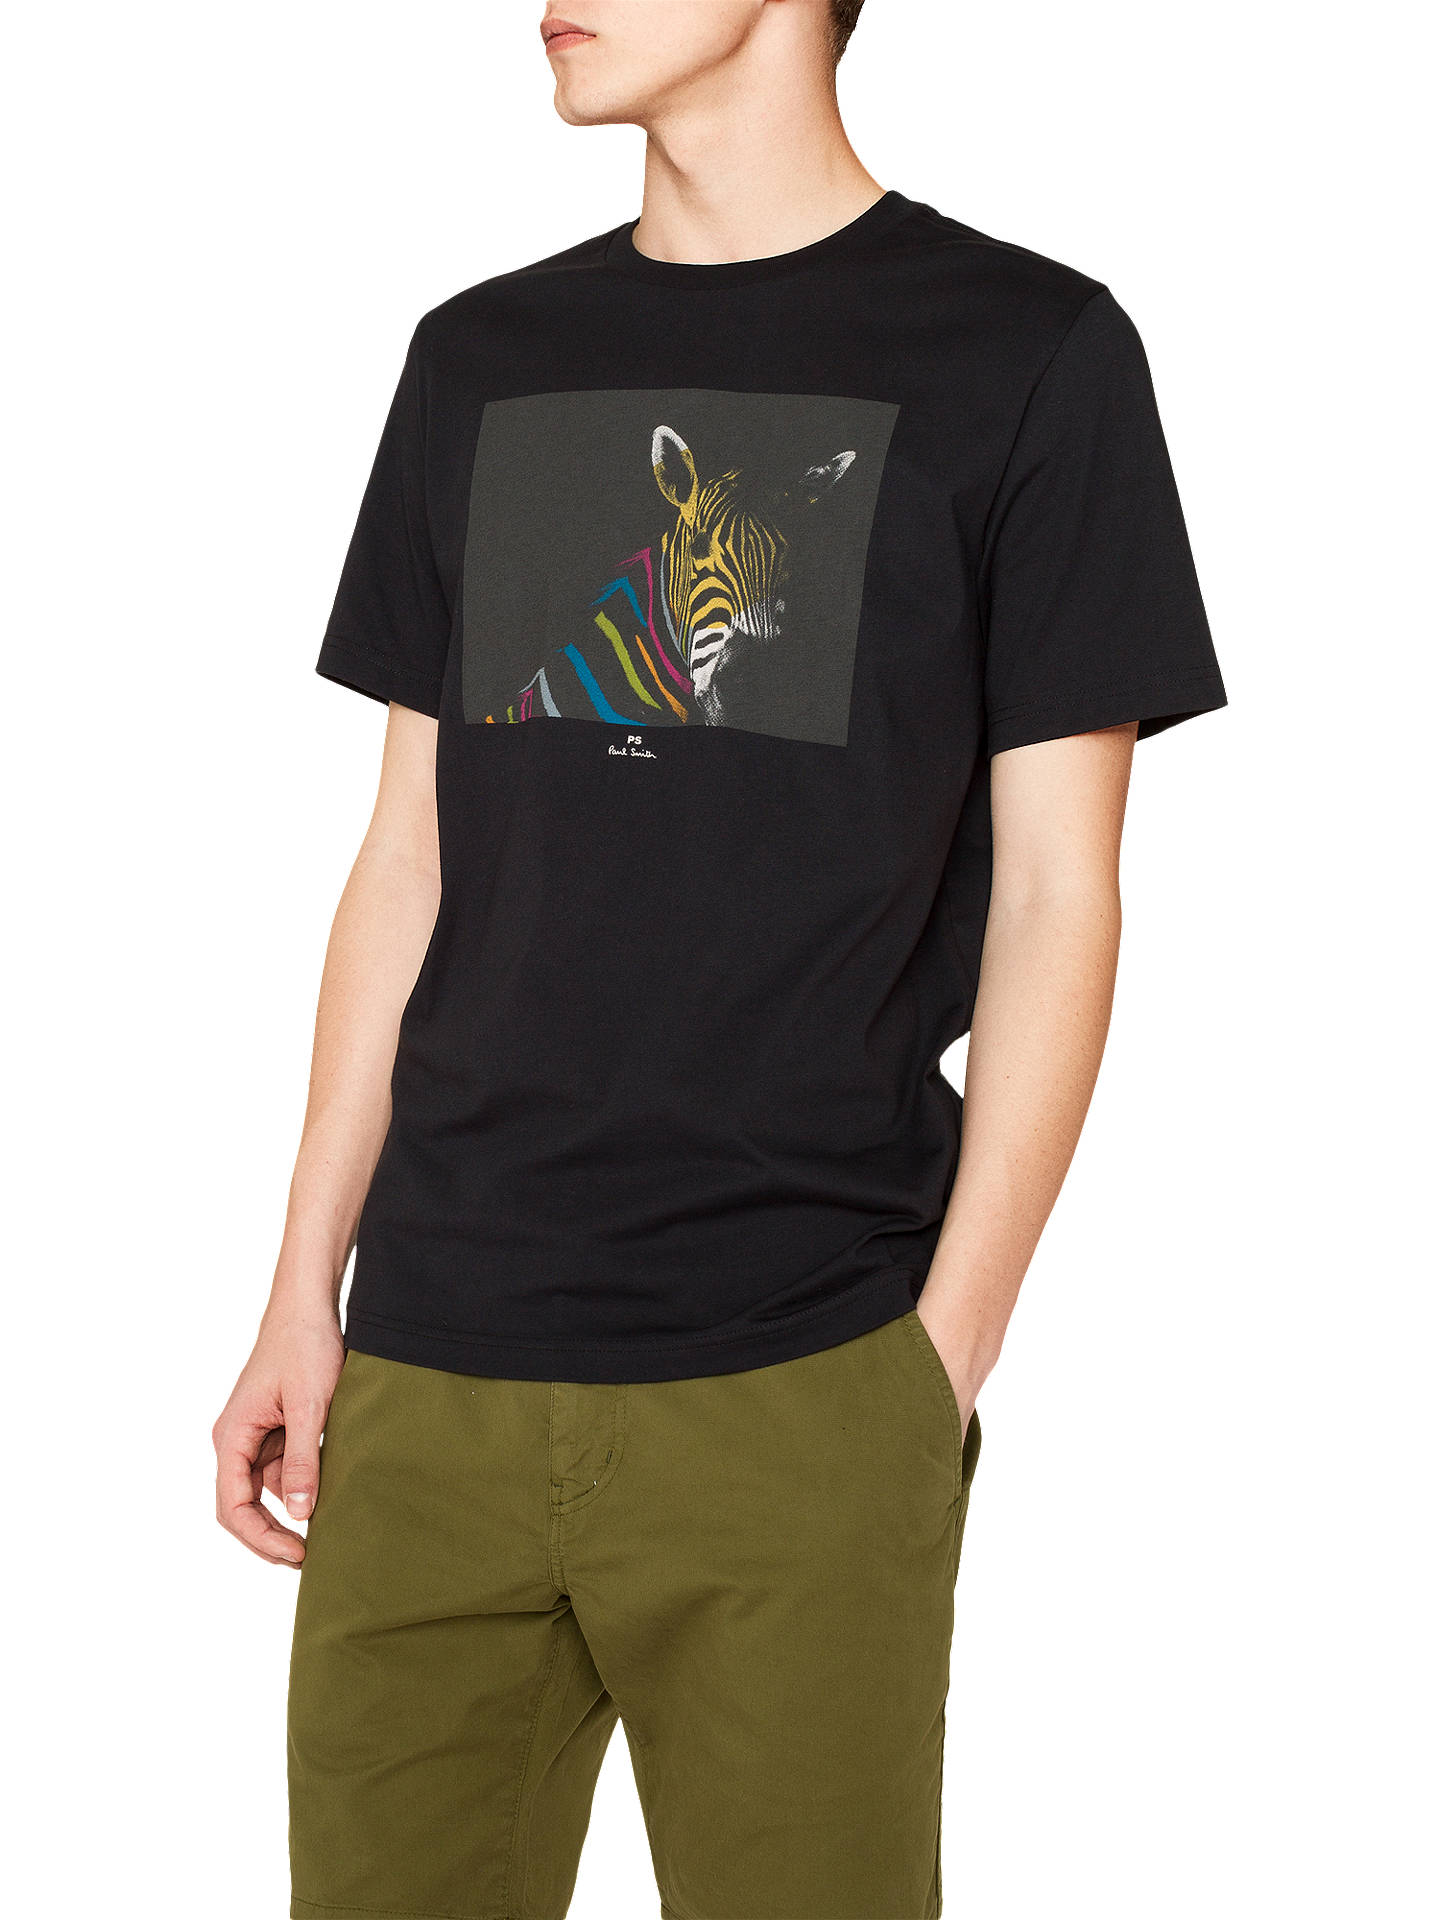 2ad72bdf Buy PS Paul Smith Zebra Graphic Print T-Shirt, Black, XL Online at ...